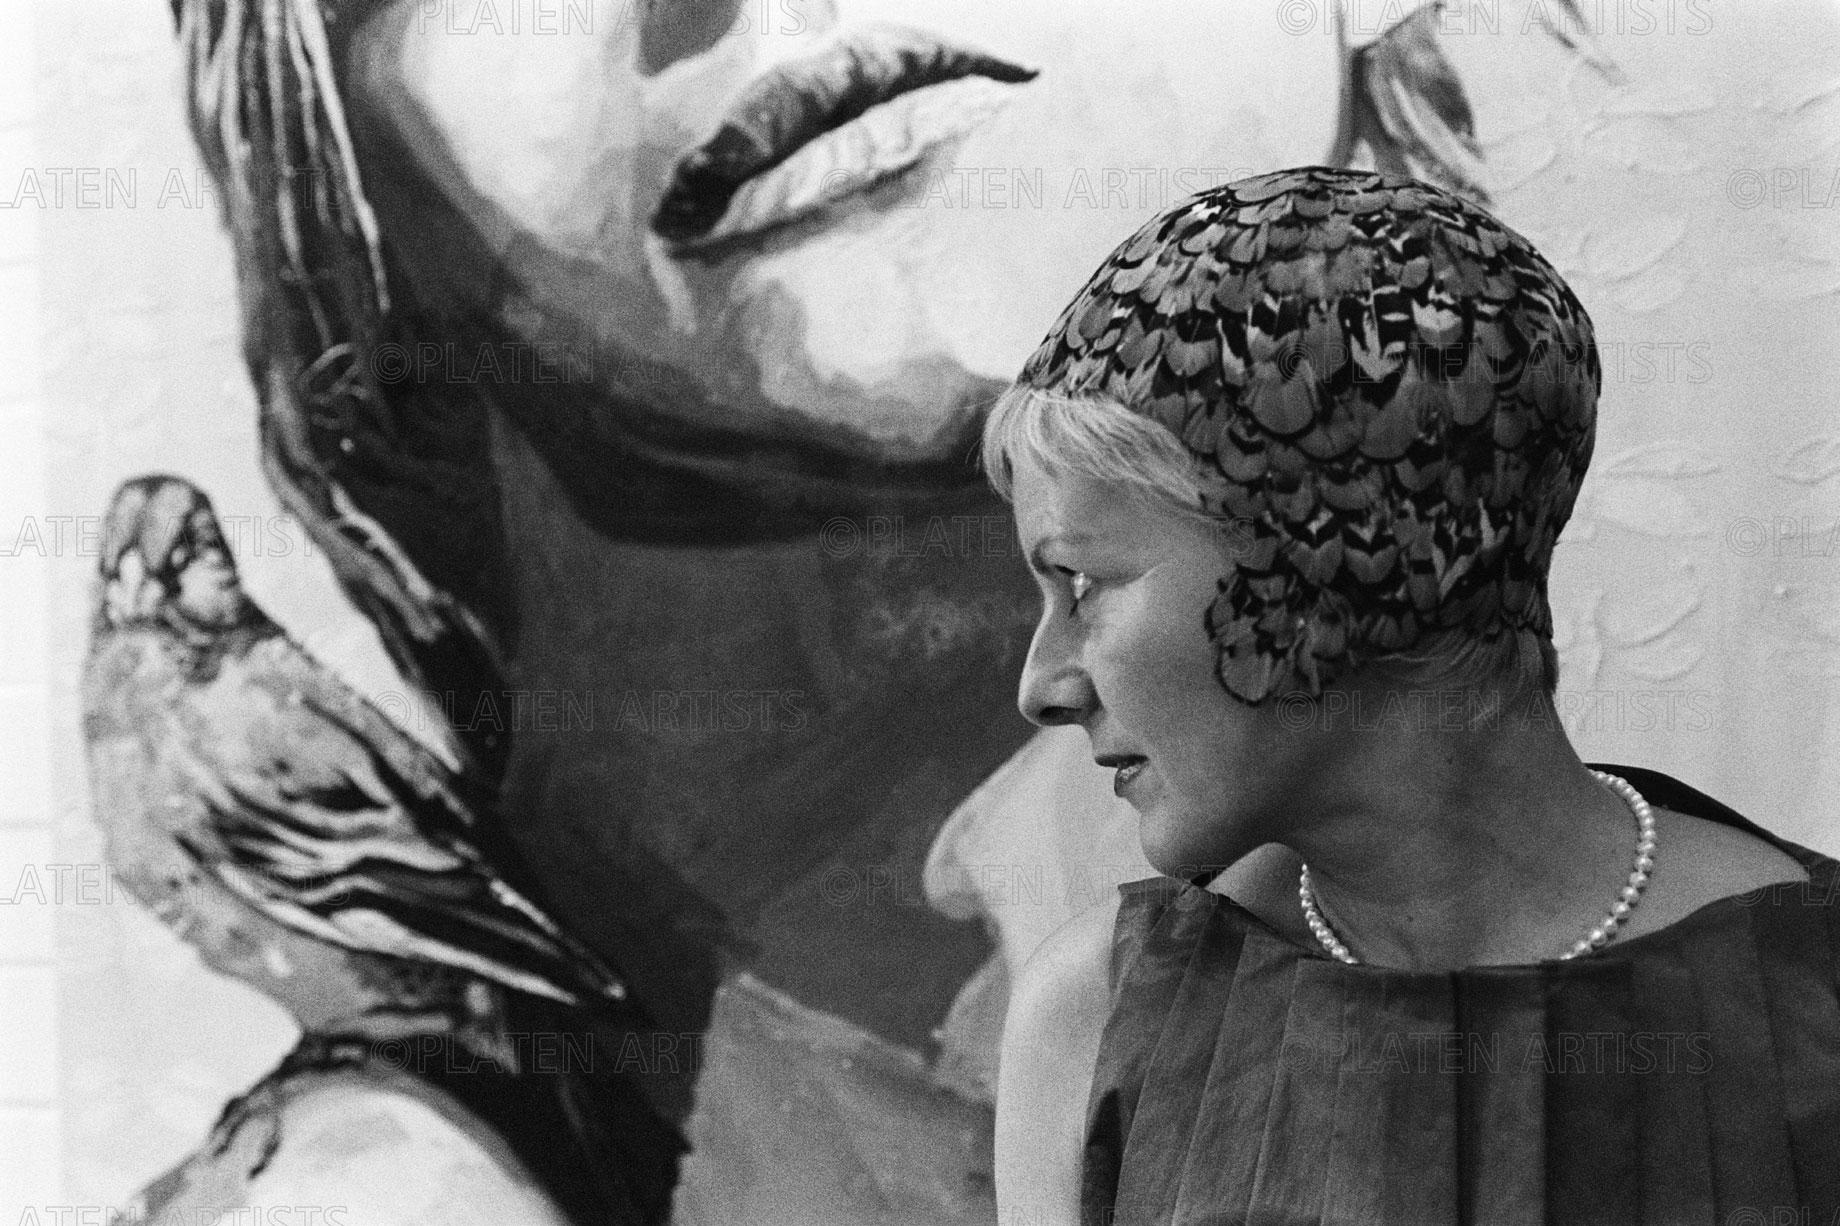 Cornelia Schleime, Federkappenvogel, Berlin, 2000